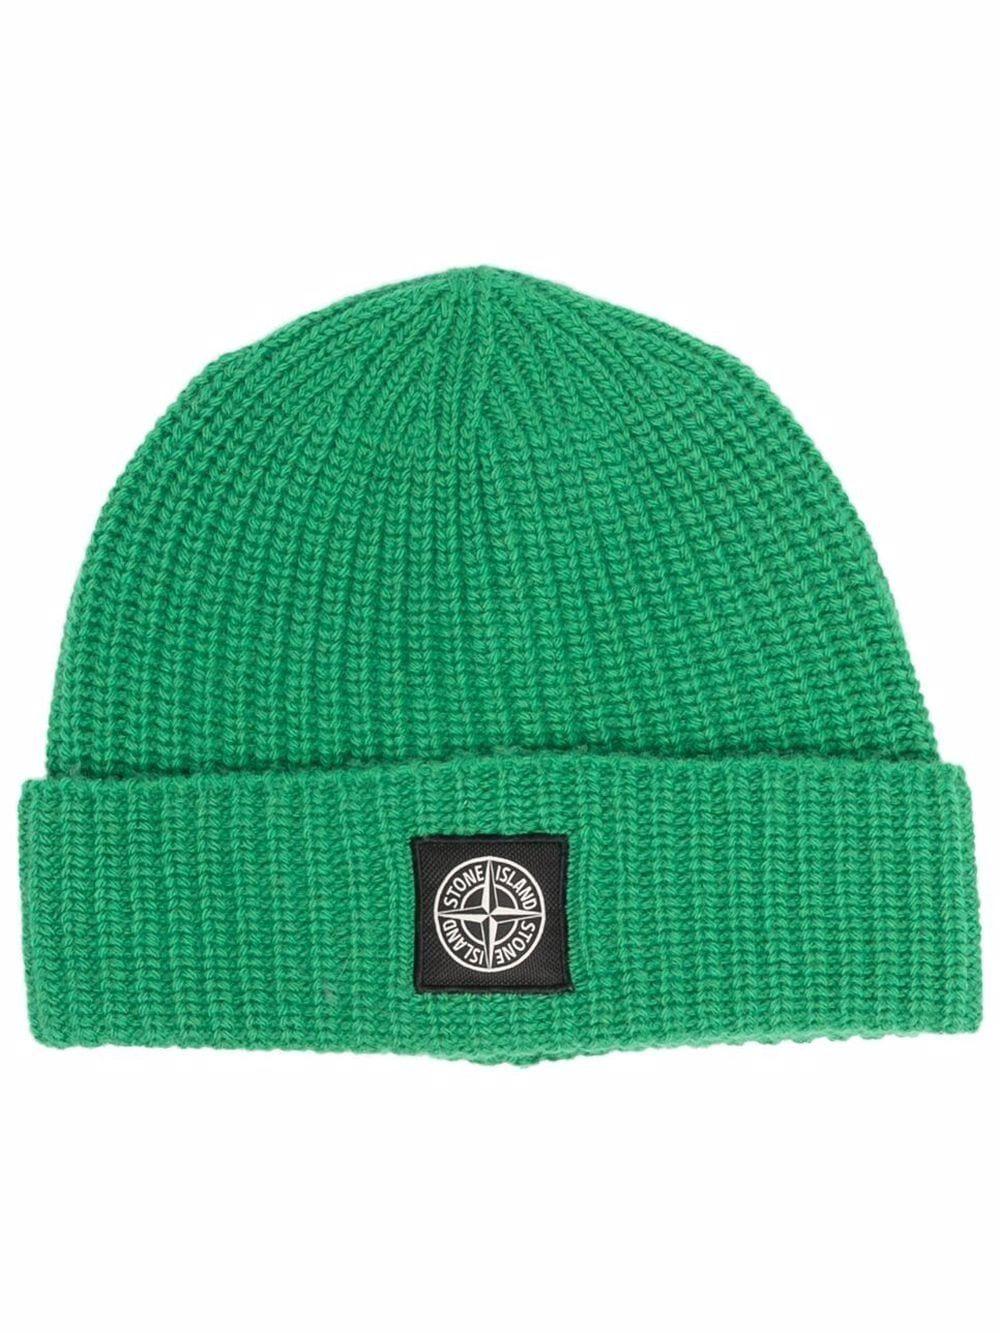 Stone island cappelli verde